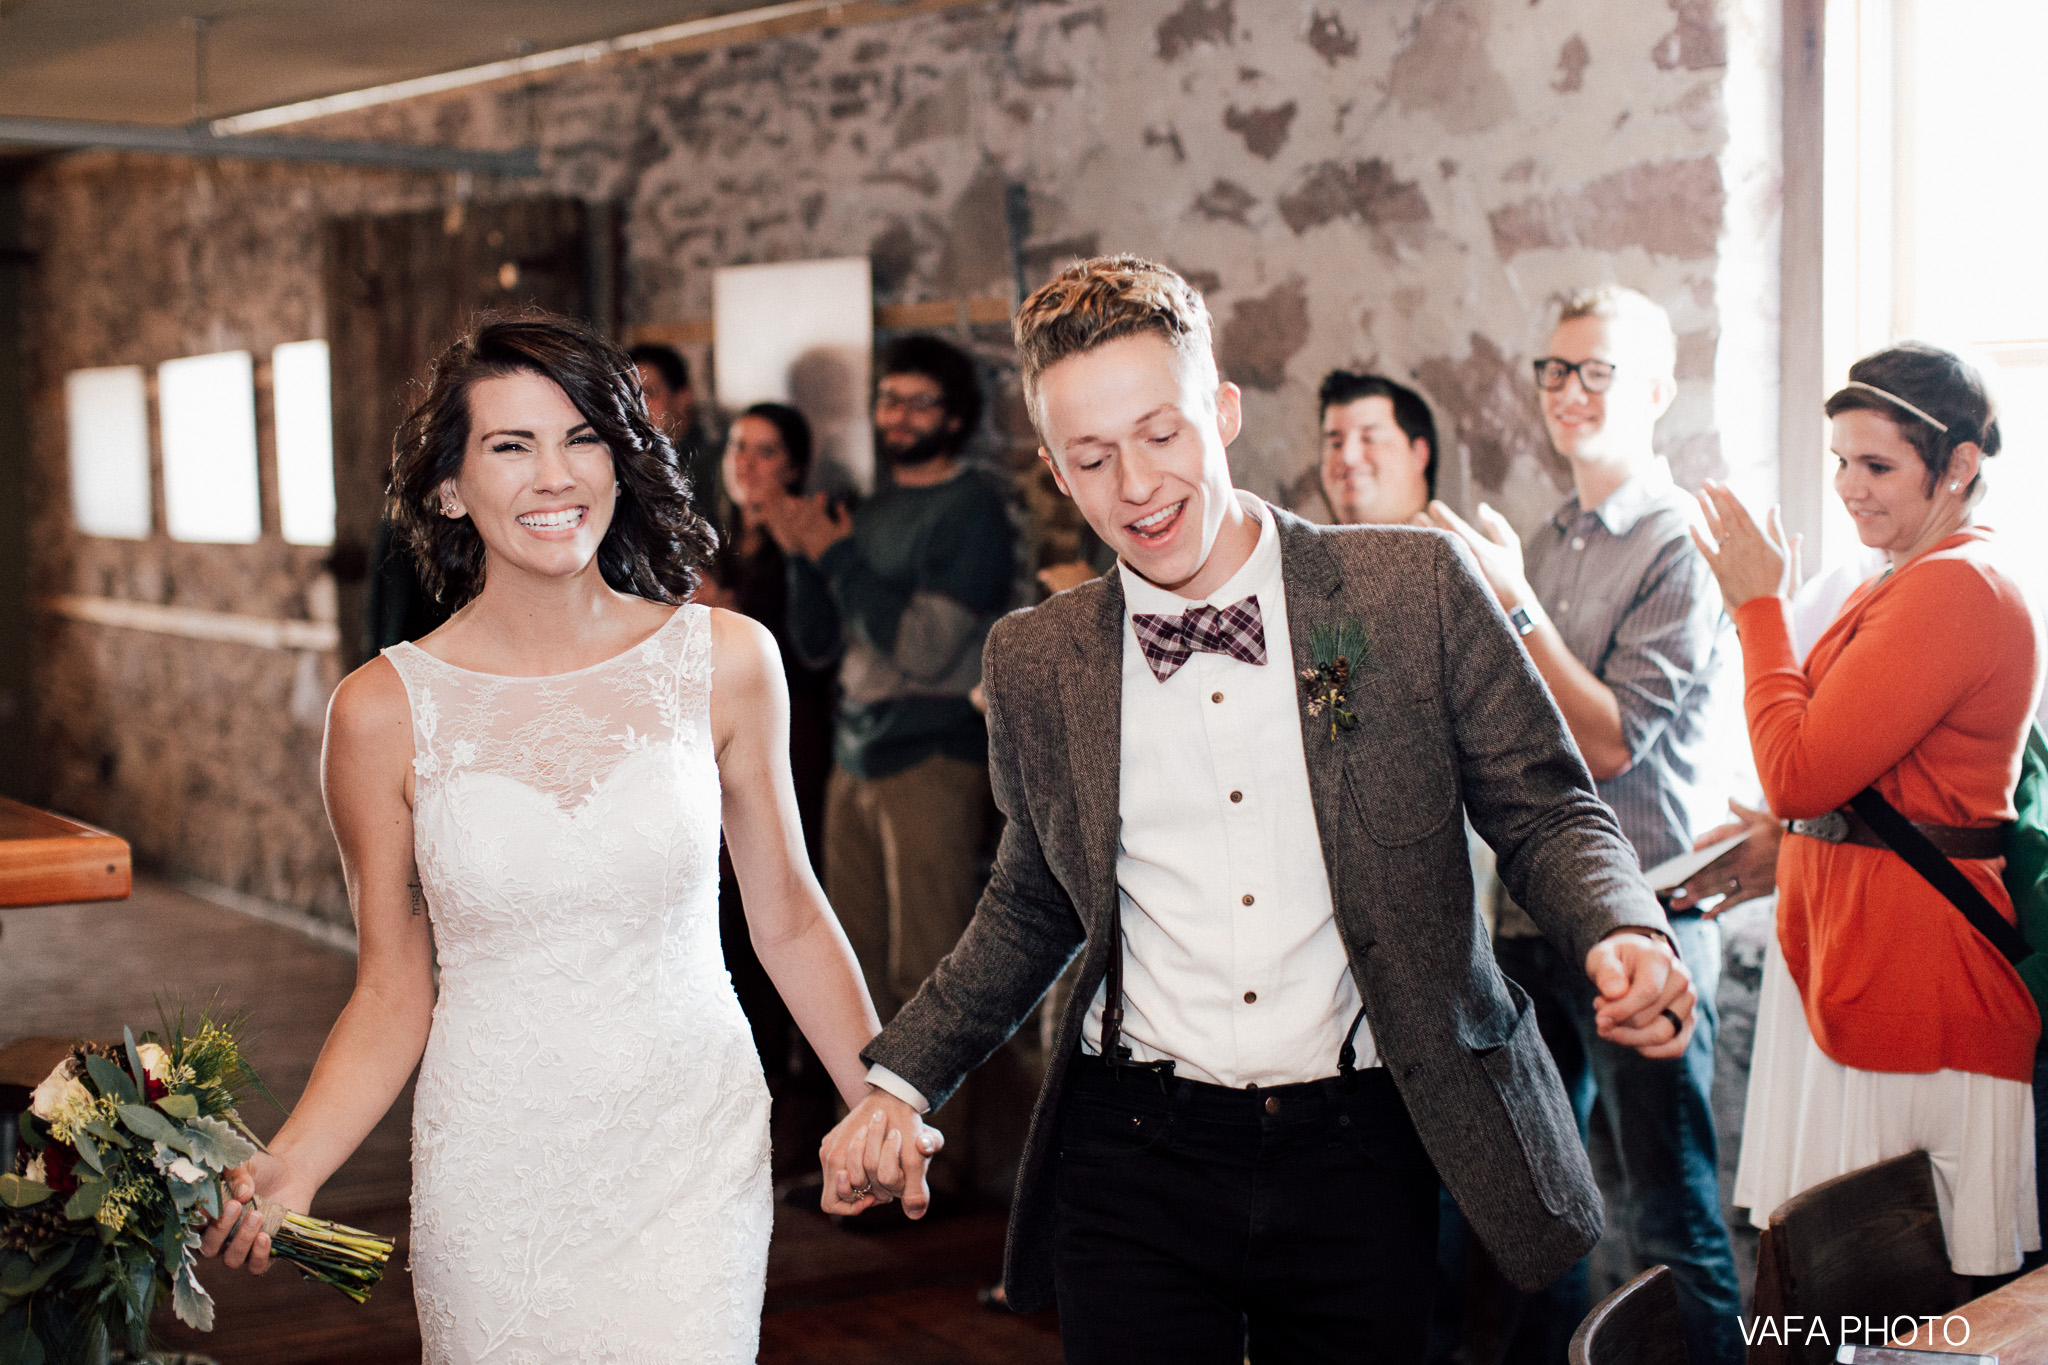 Hogback-Mountain-Wedding-Chelsea-Josh-Vafa-Photo-727.jpg